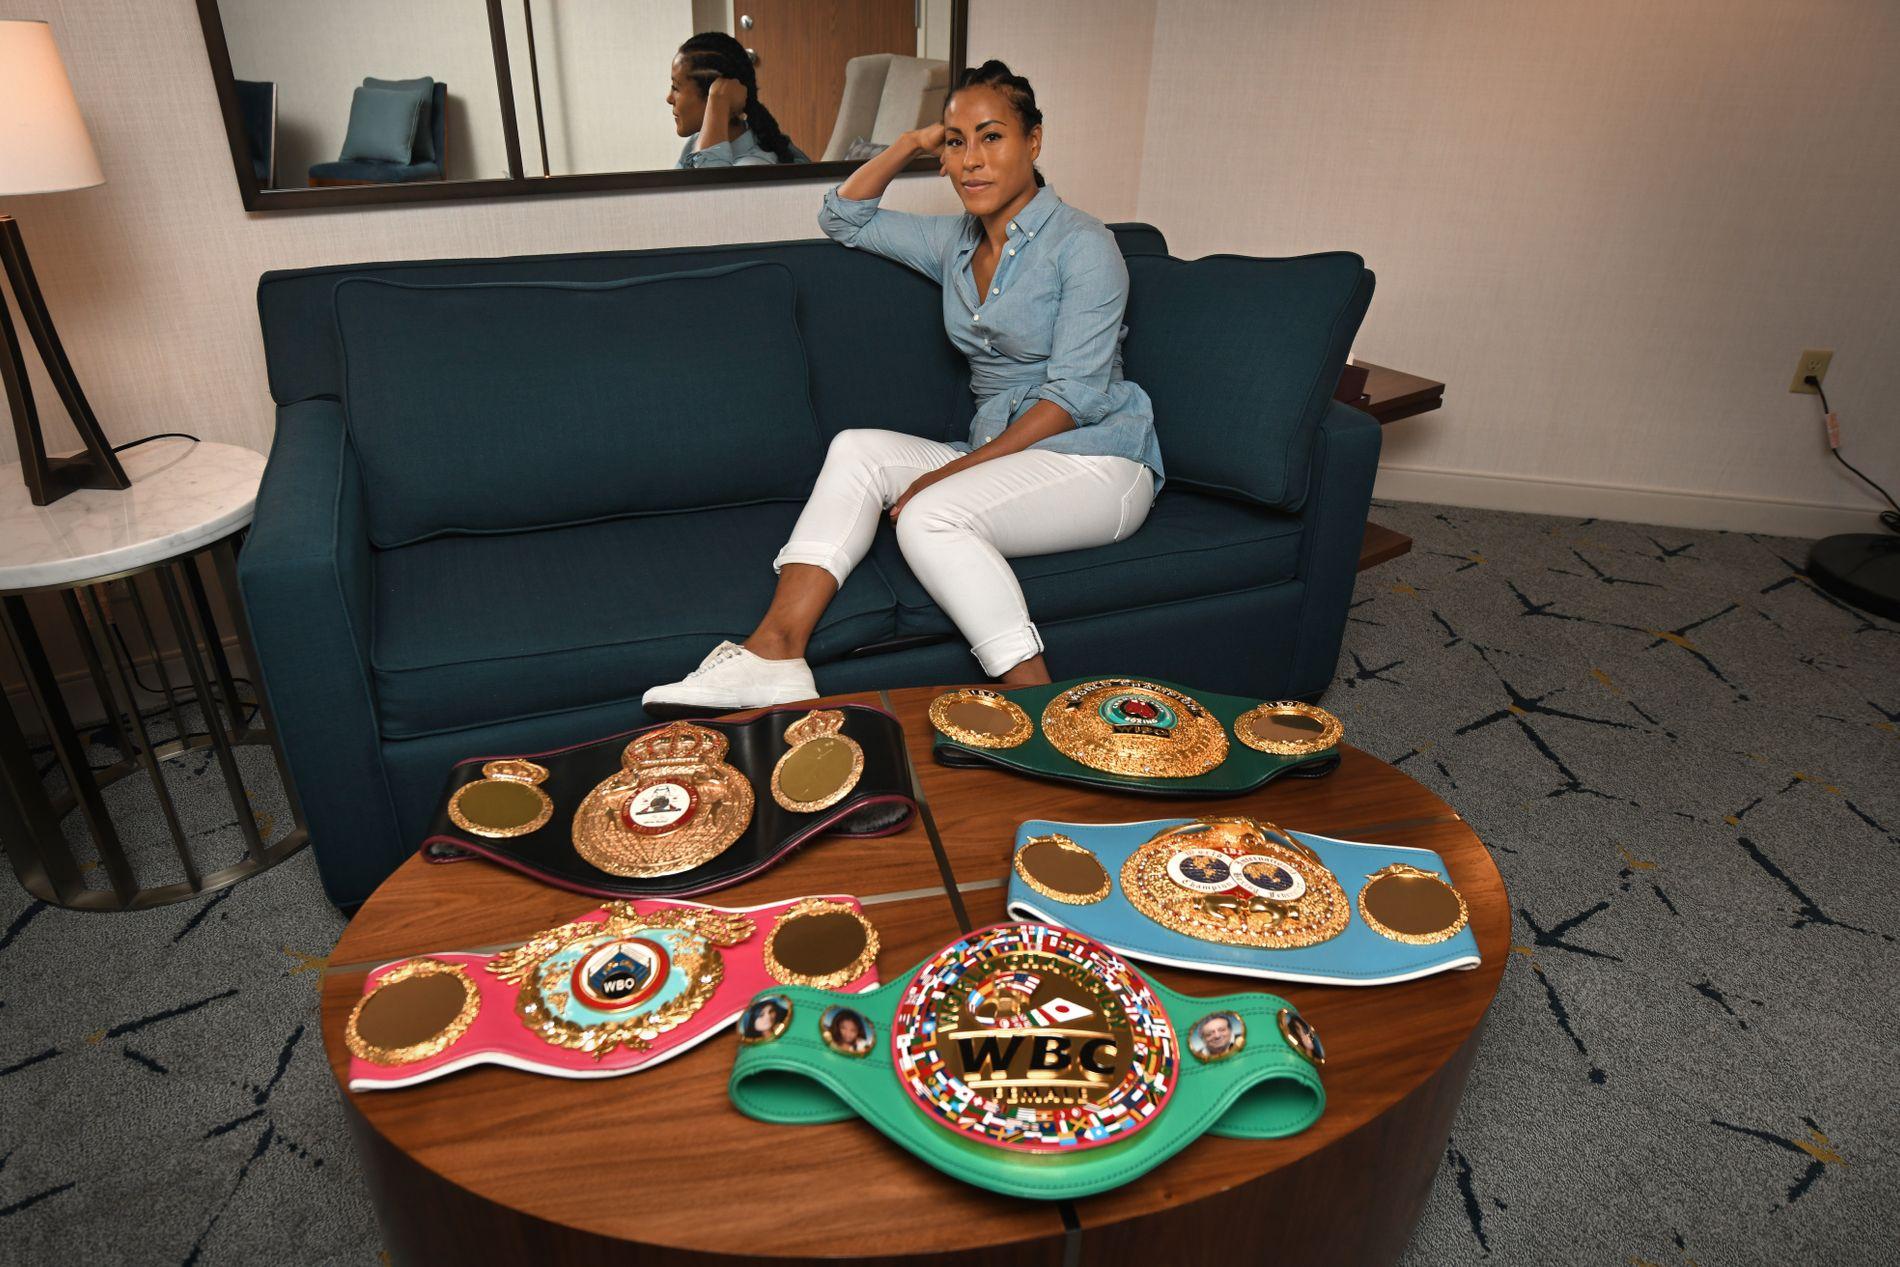 BEHOLDT «BELTE-FAMILIEN»: De fem VM-beltene i weltervekt tilhører fortsatt Cecilia Brækhus. På rommet på Sheraton Gateway Hotel i Los Angeles poserer hun med beltene fra WBC (foran), WBO (midten til venstre), IBF, WBA (bak til venstre og IBO.